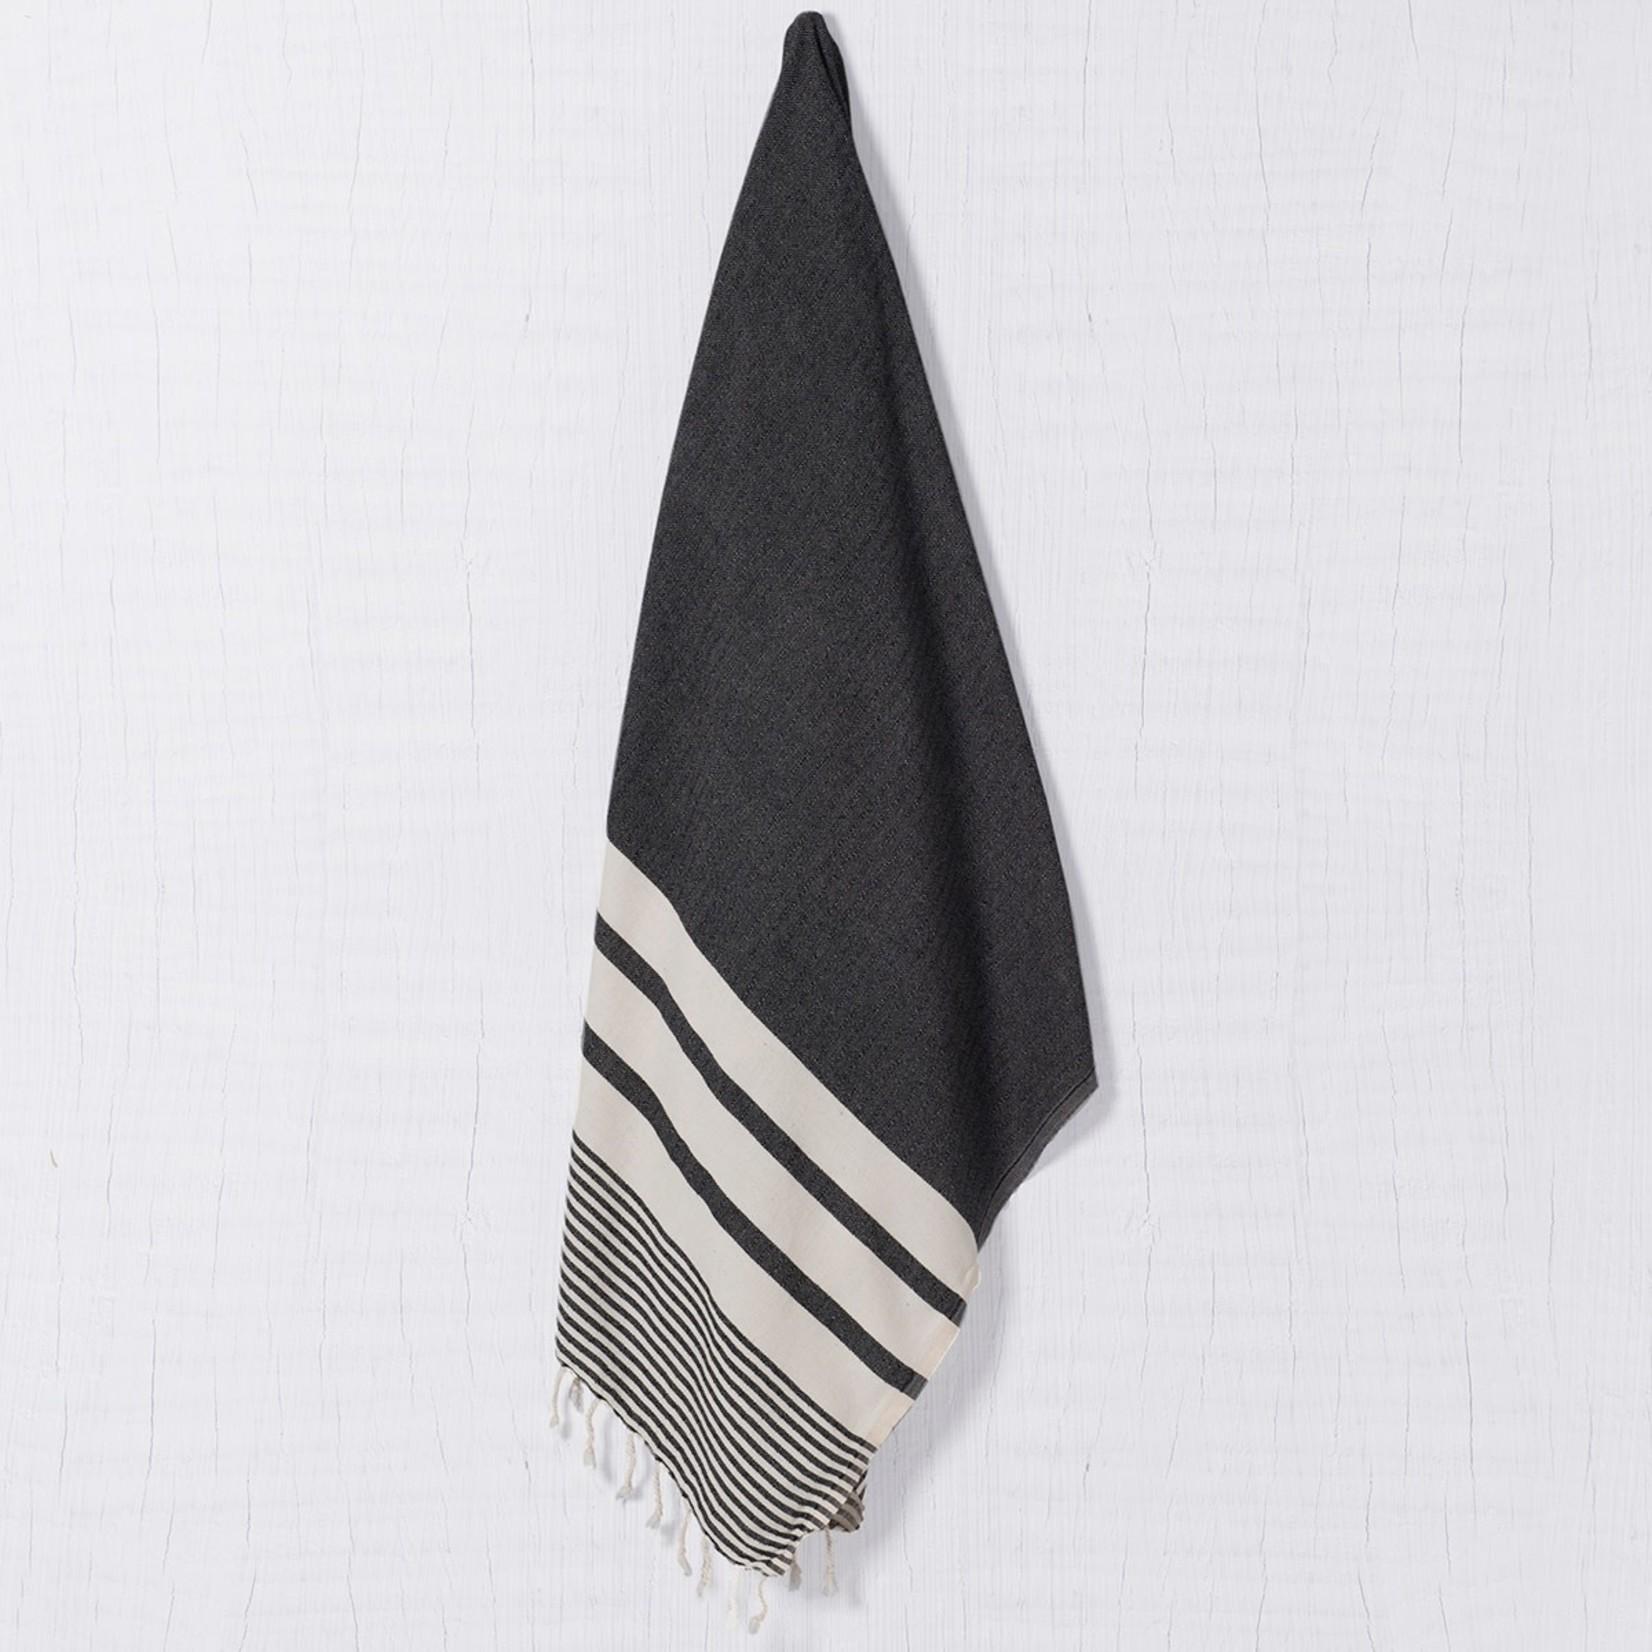 Buldano Buldano Turkish Towel Peshtemal KREMBCOT Black